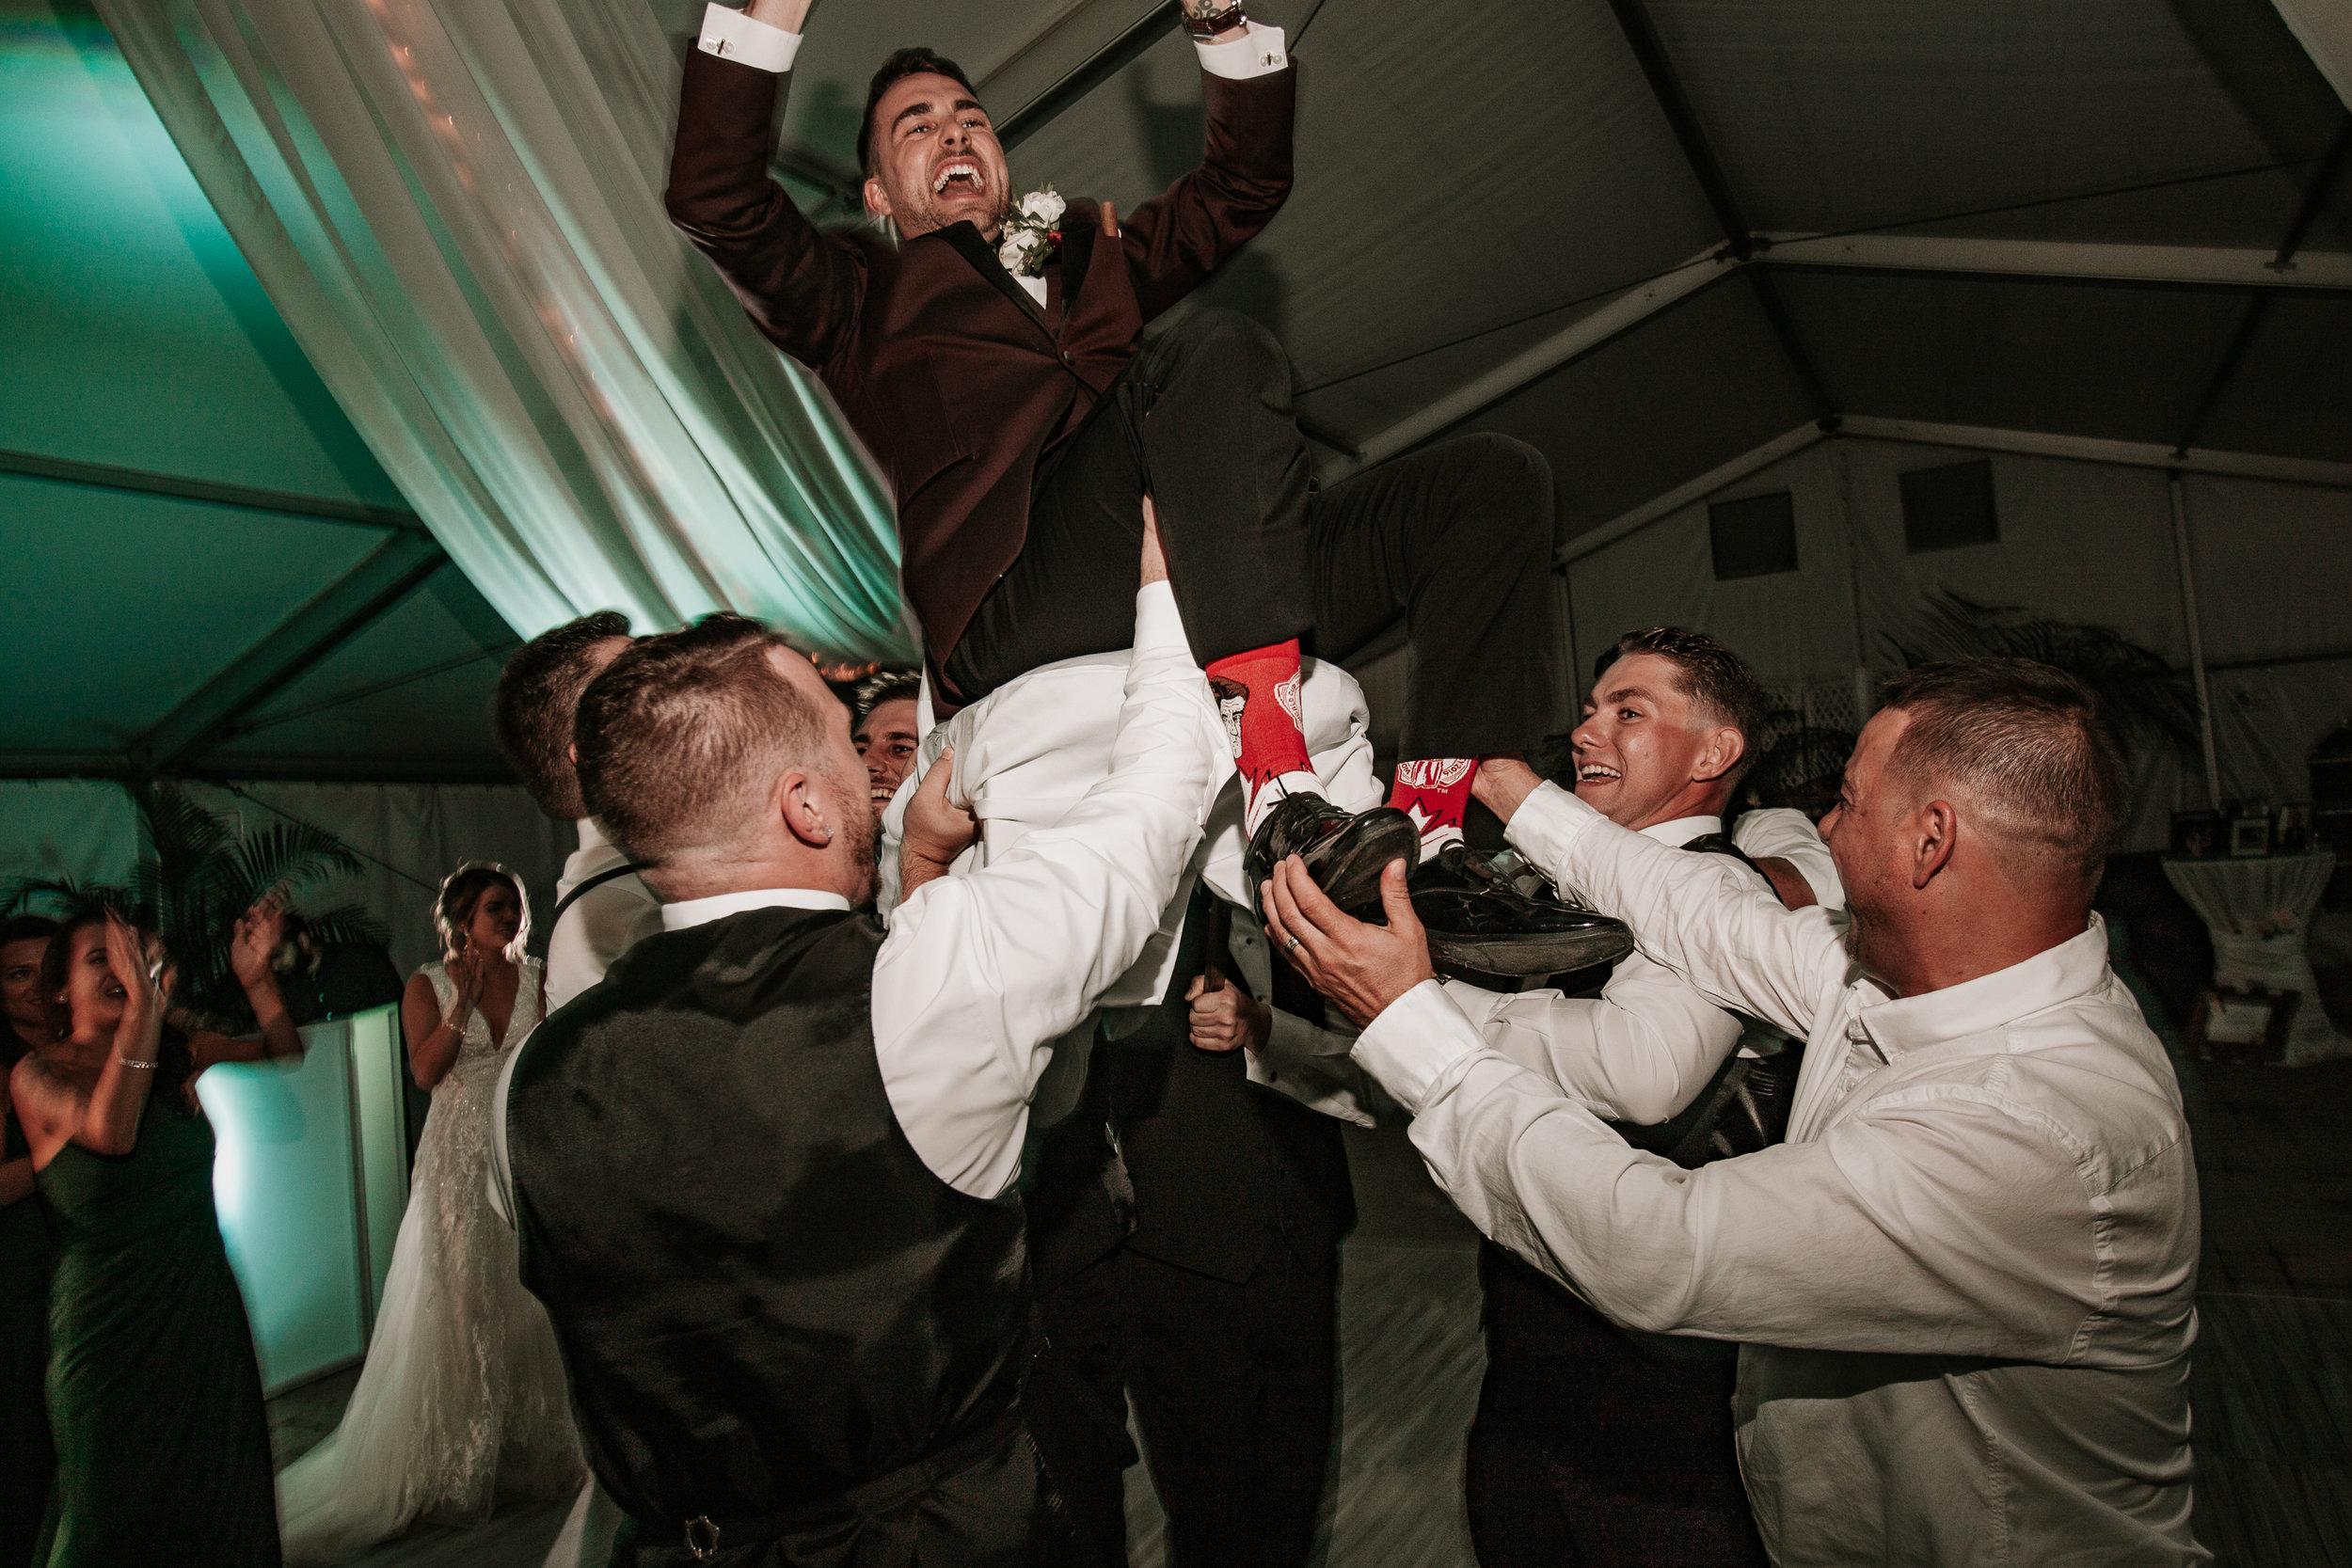 Claremont_fourseasons_Wedding-554.jpg